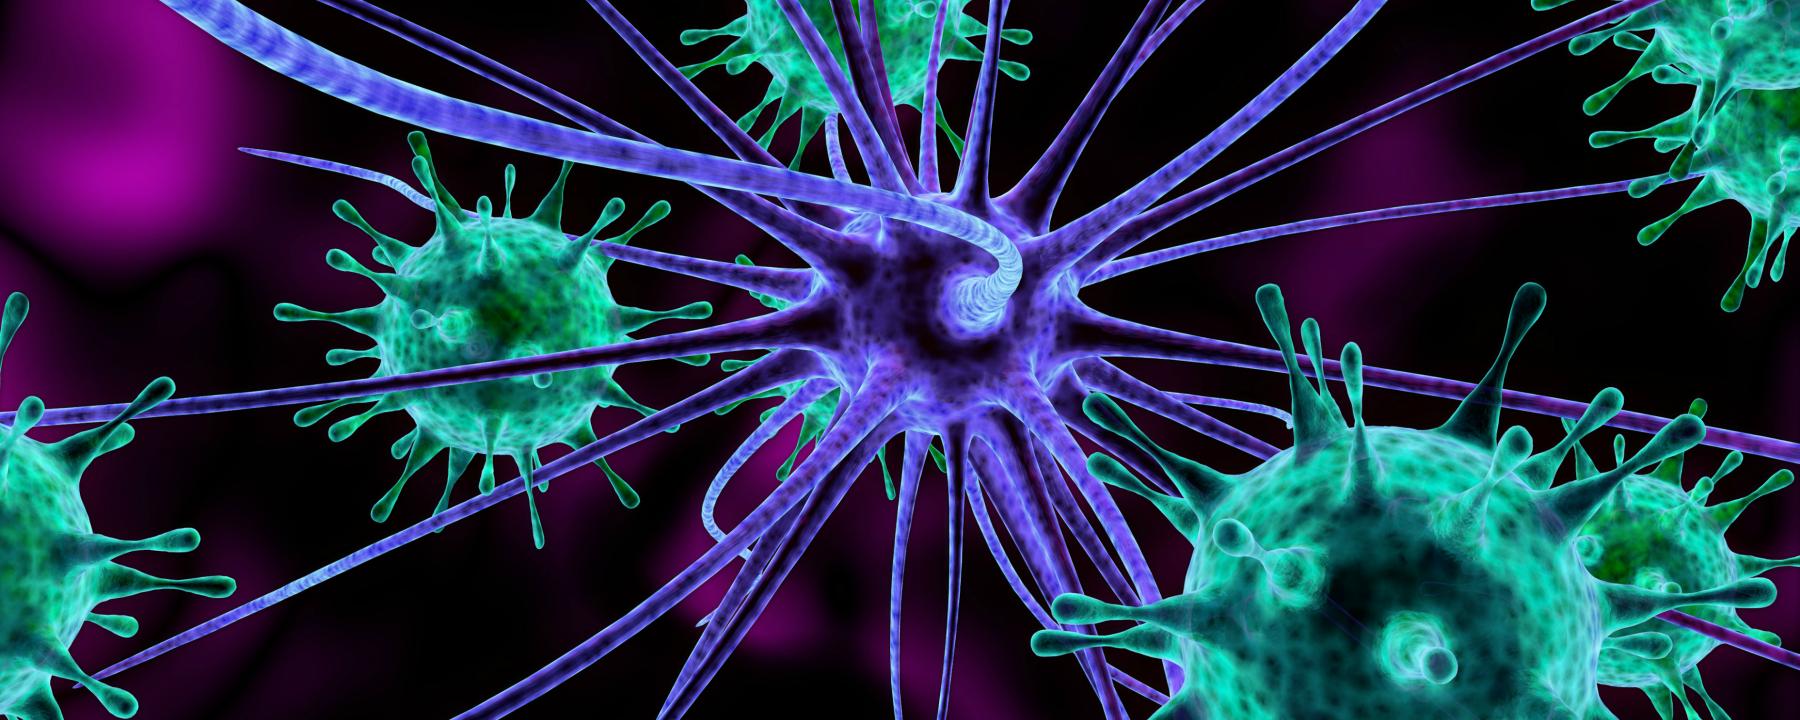 Study Finds No Association Between Herpes Virus and Alzheimer's